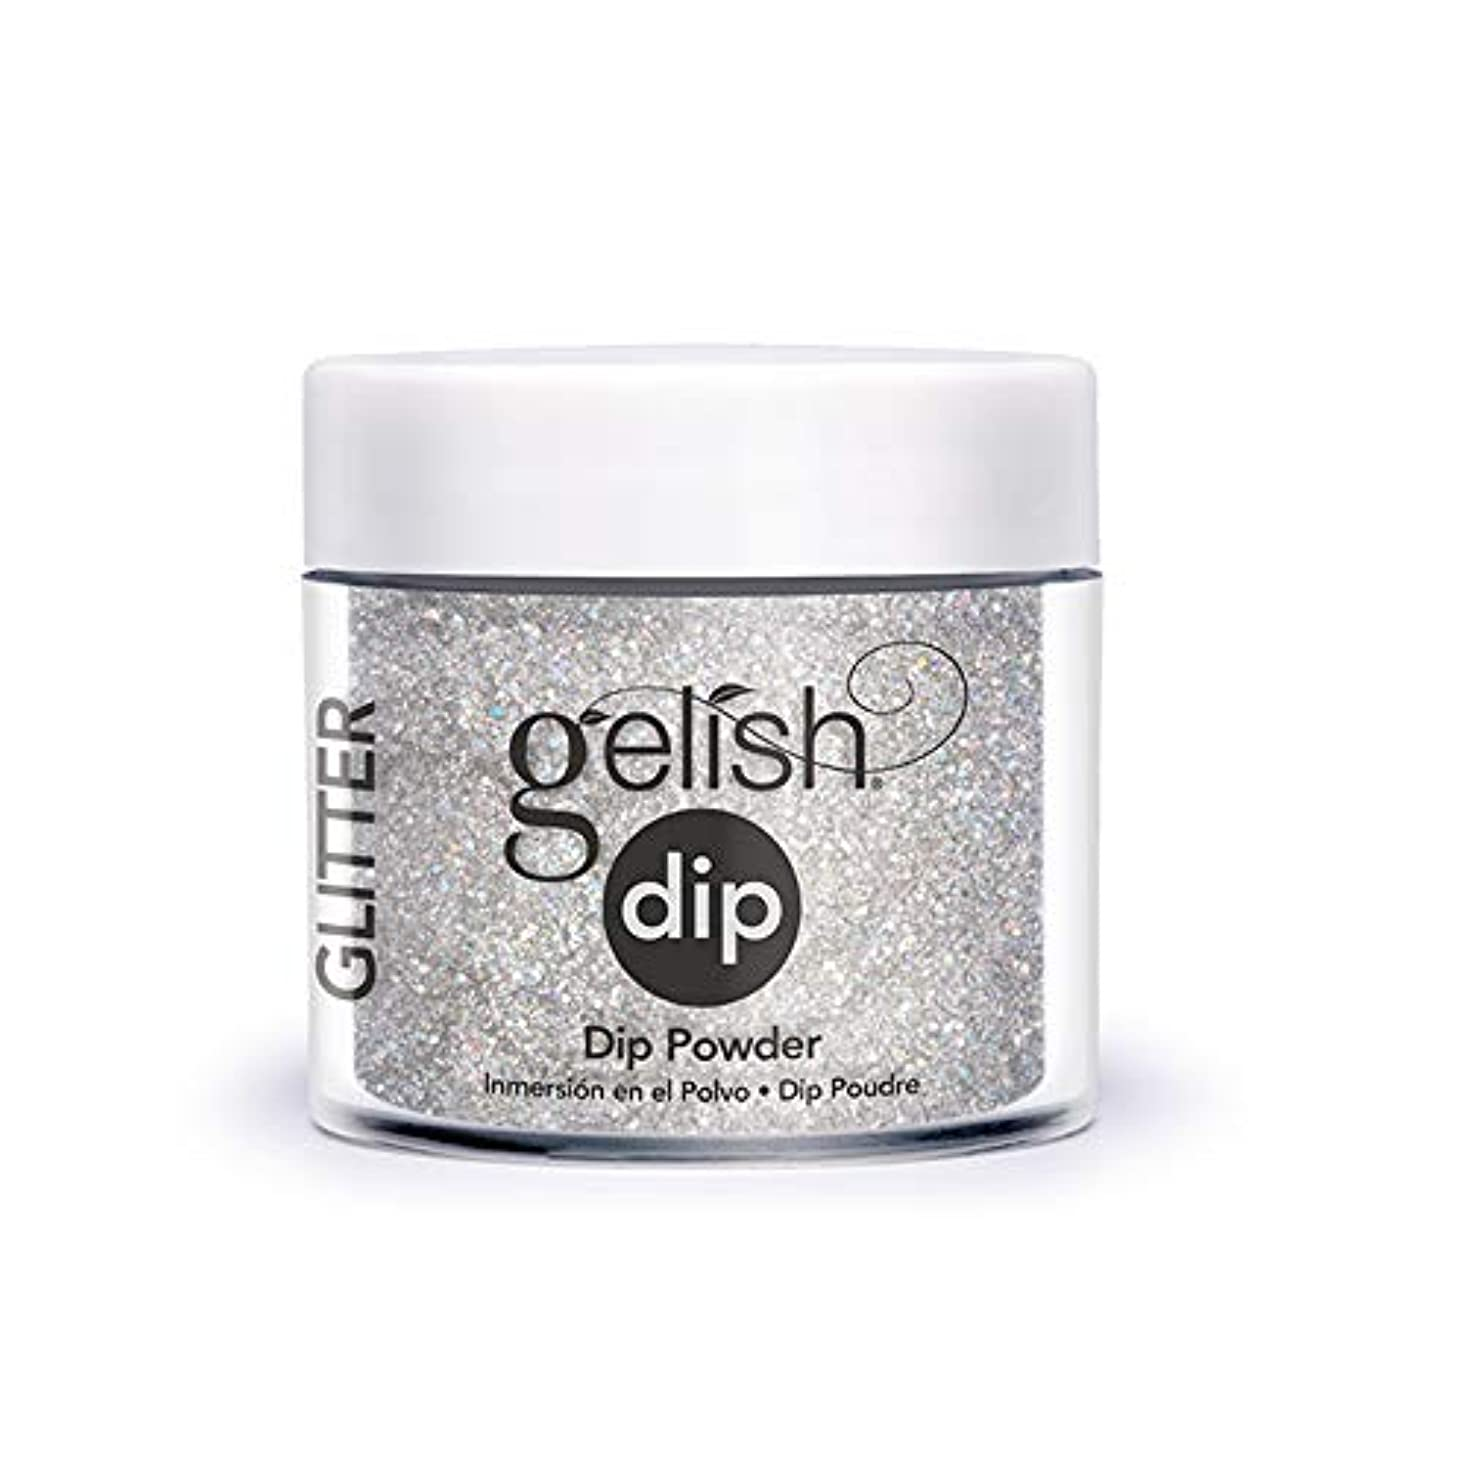 Harmony Gelish - Acrylic Dip Powder - Fame Game - 23g / 0.8oz